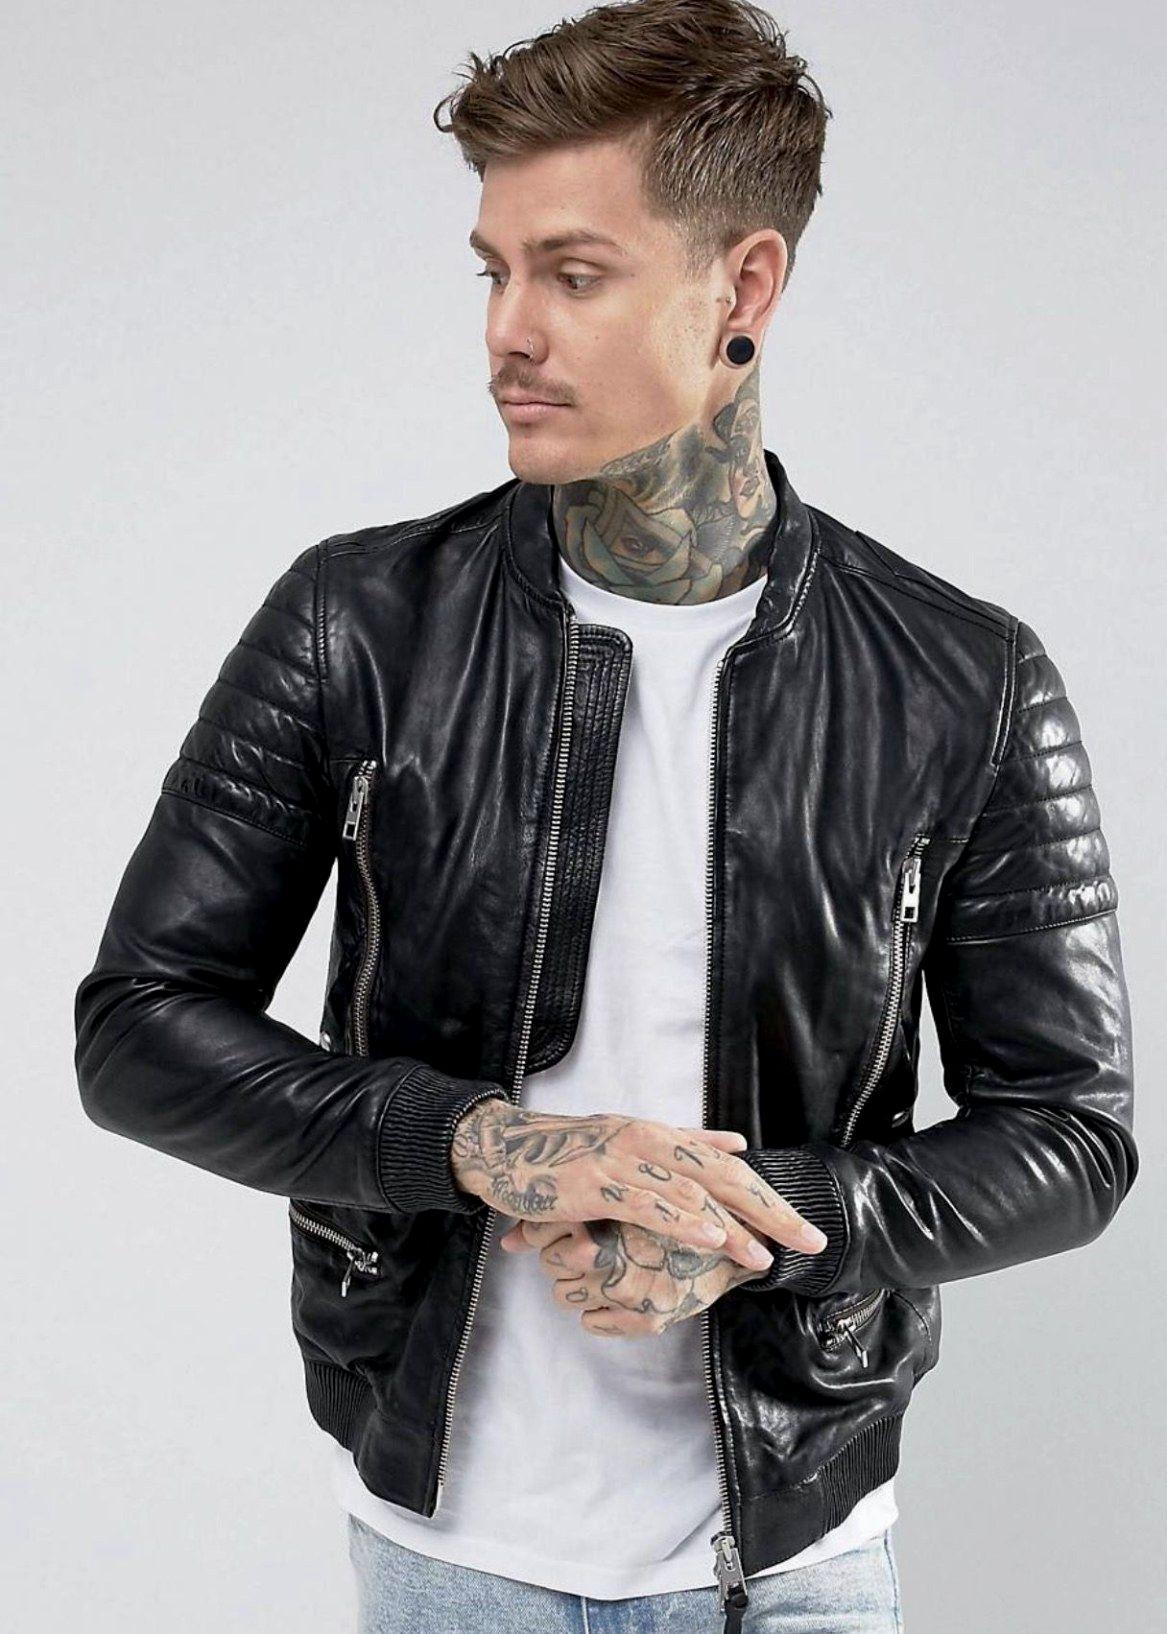 Men S Jacket Value Men S Jacket Types In 2019 Jackets Bomber